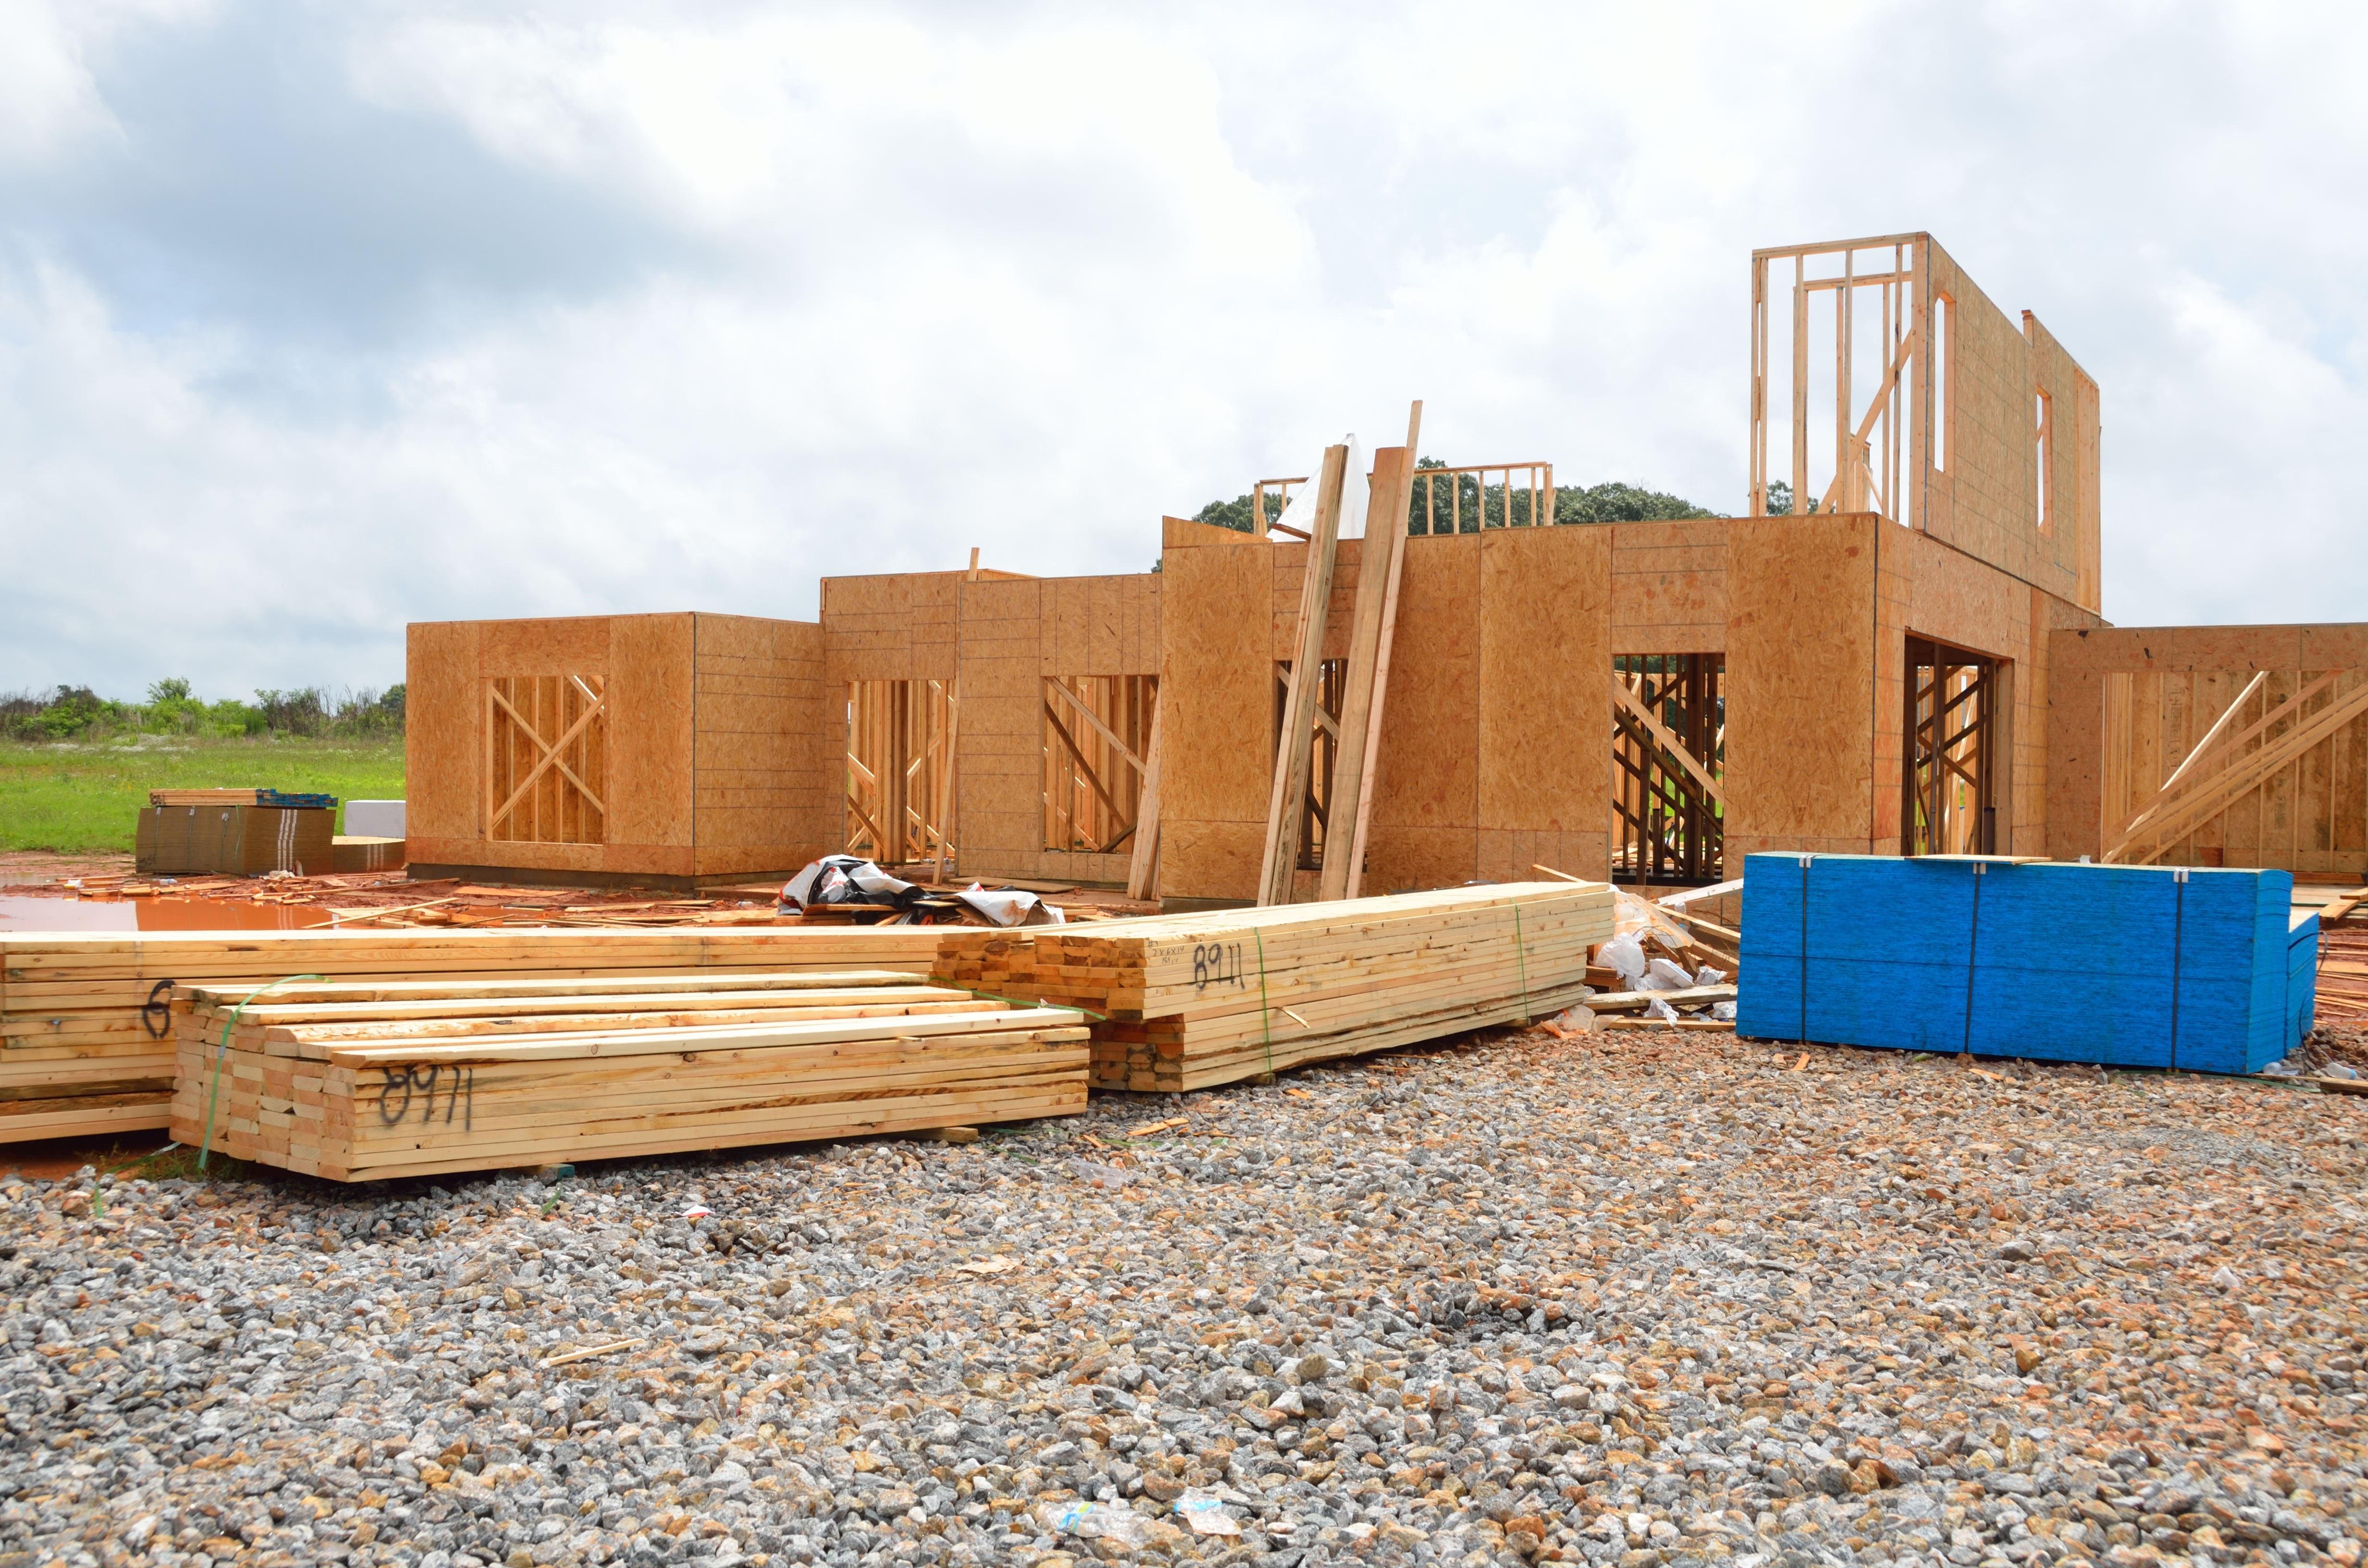 Fotos gratis : arquitectura, estructura, cielo, madera, casa, techo ...